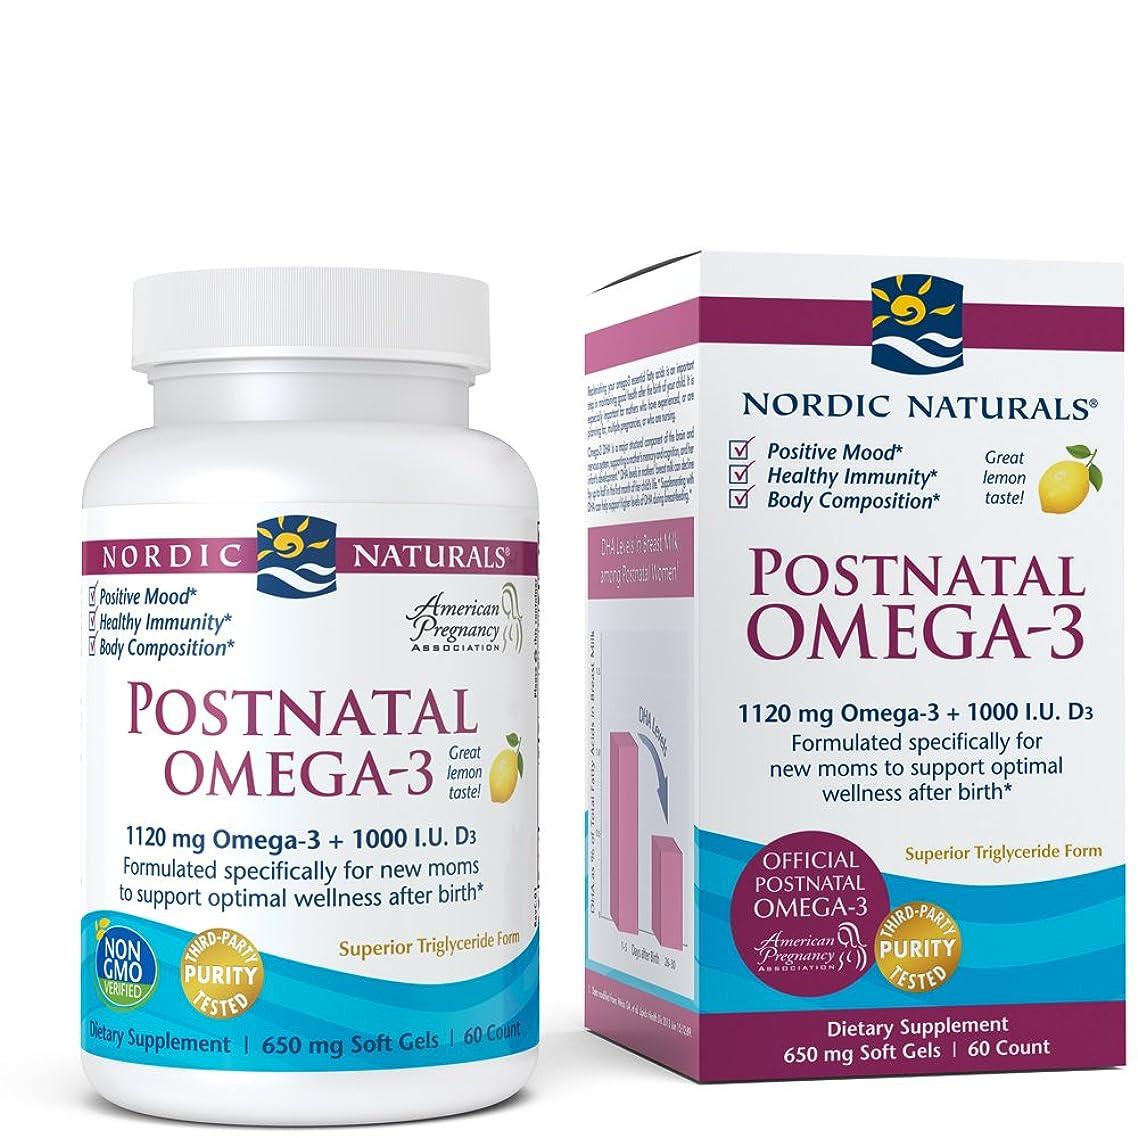 Nordic Naturals Postnatal Omega-3 - Formulated Specifically for New Moms to Support Optimal Wellness After Birth, Lemon, 60 Soft Gels